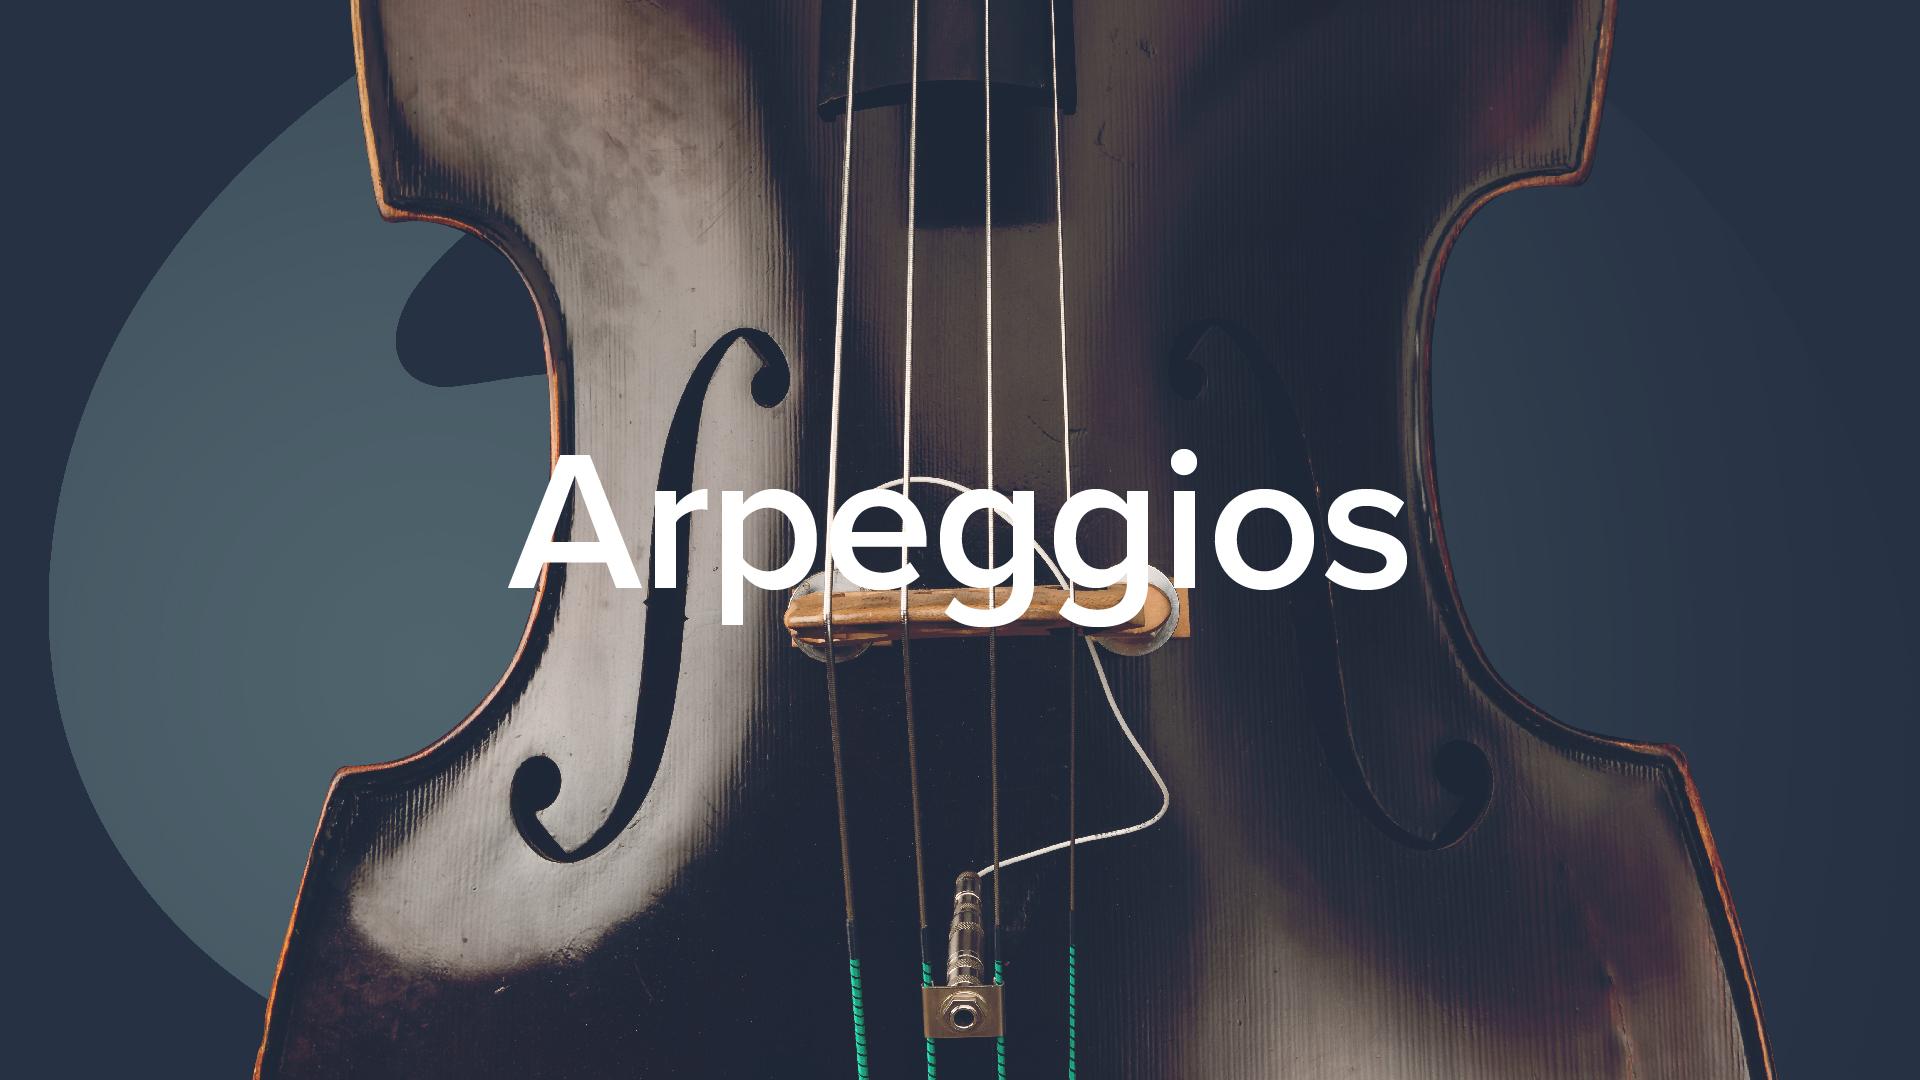 Double Bass Arpeggios - Geoff Chalmers